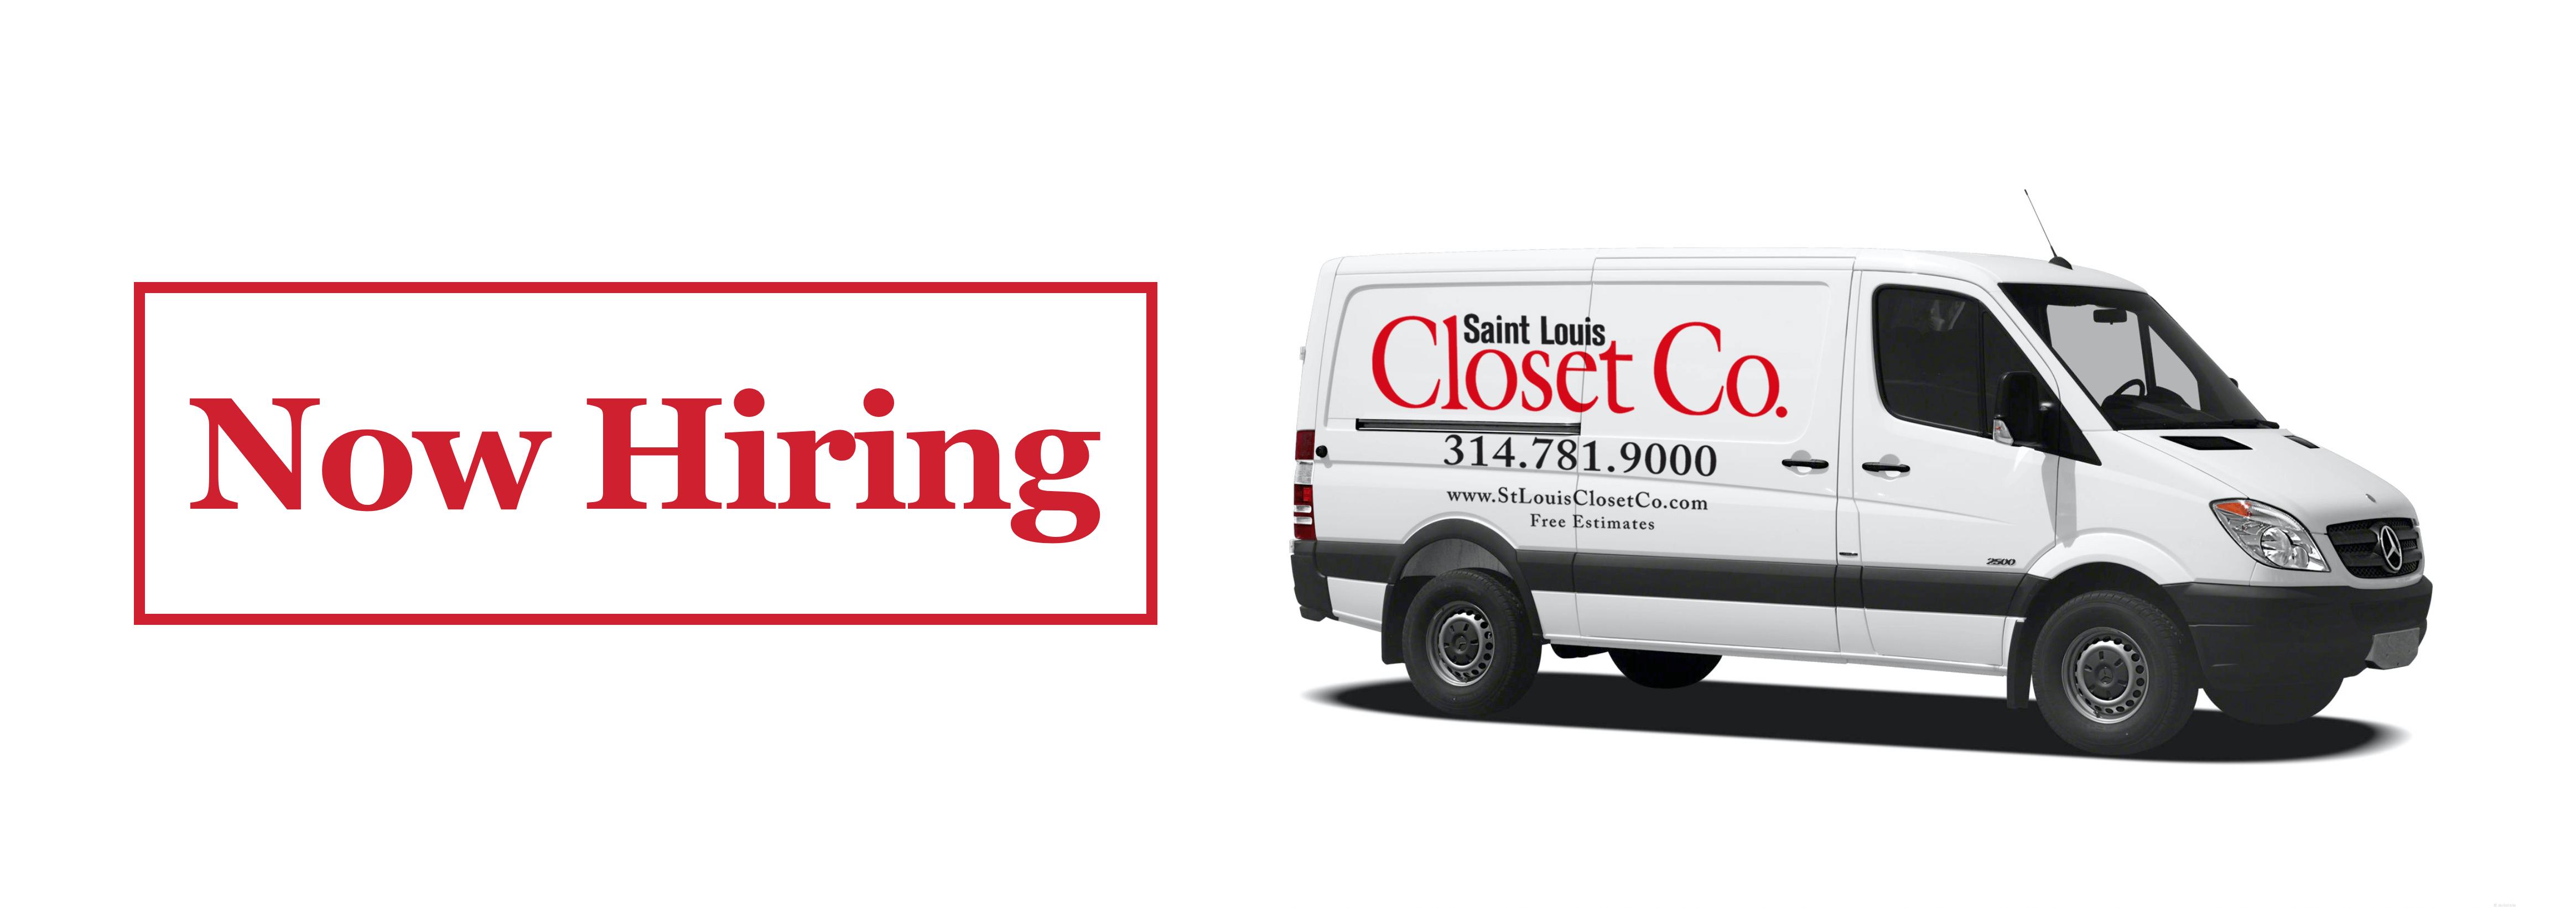 St Louis Closet Co now hiring van